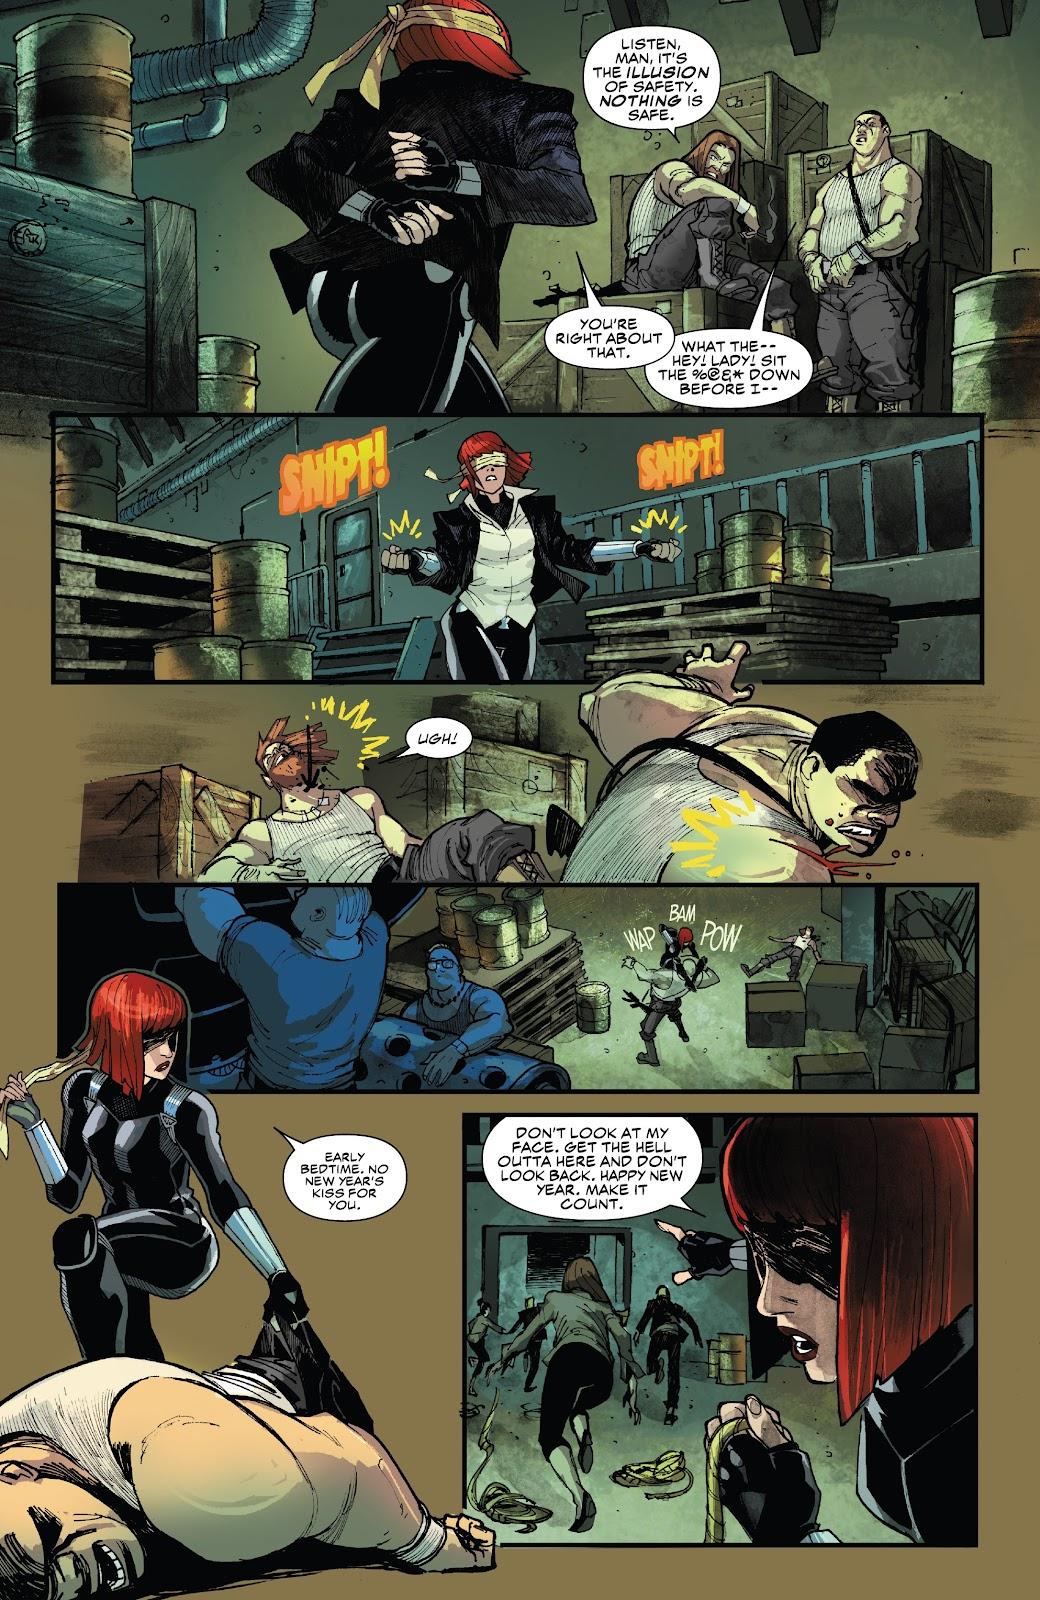 Read online Black Widow (2019) comic -  Issue #1 - 8